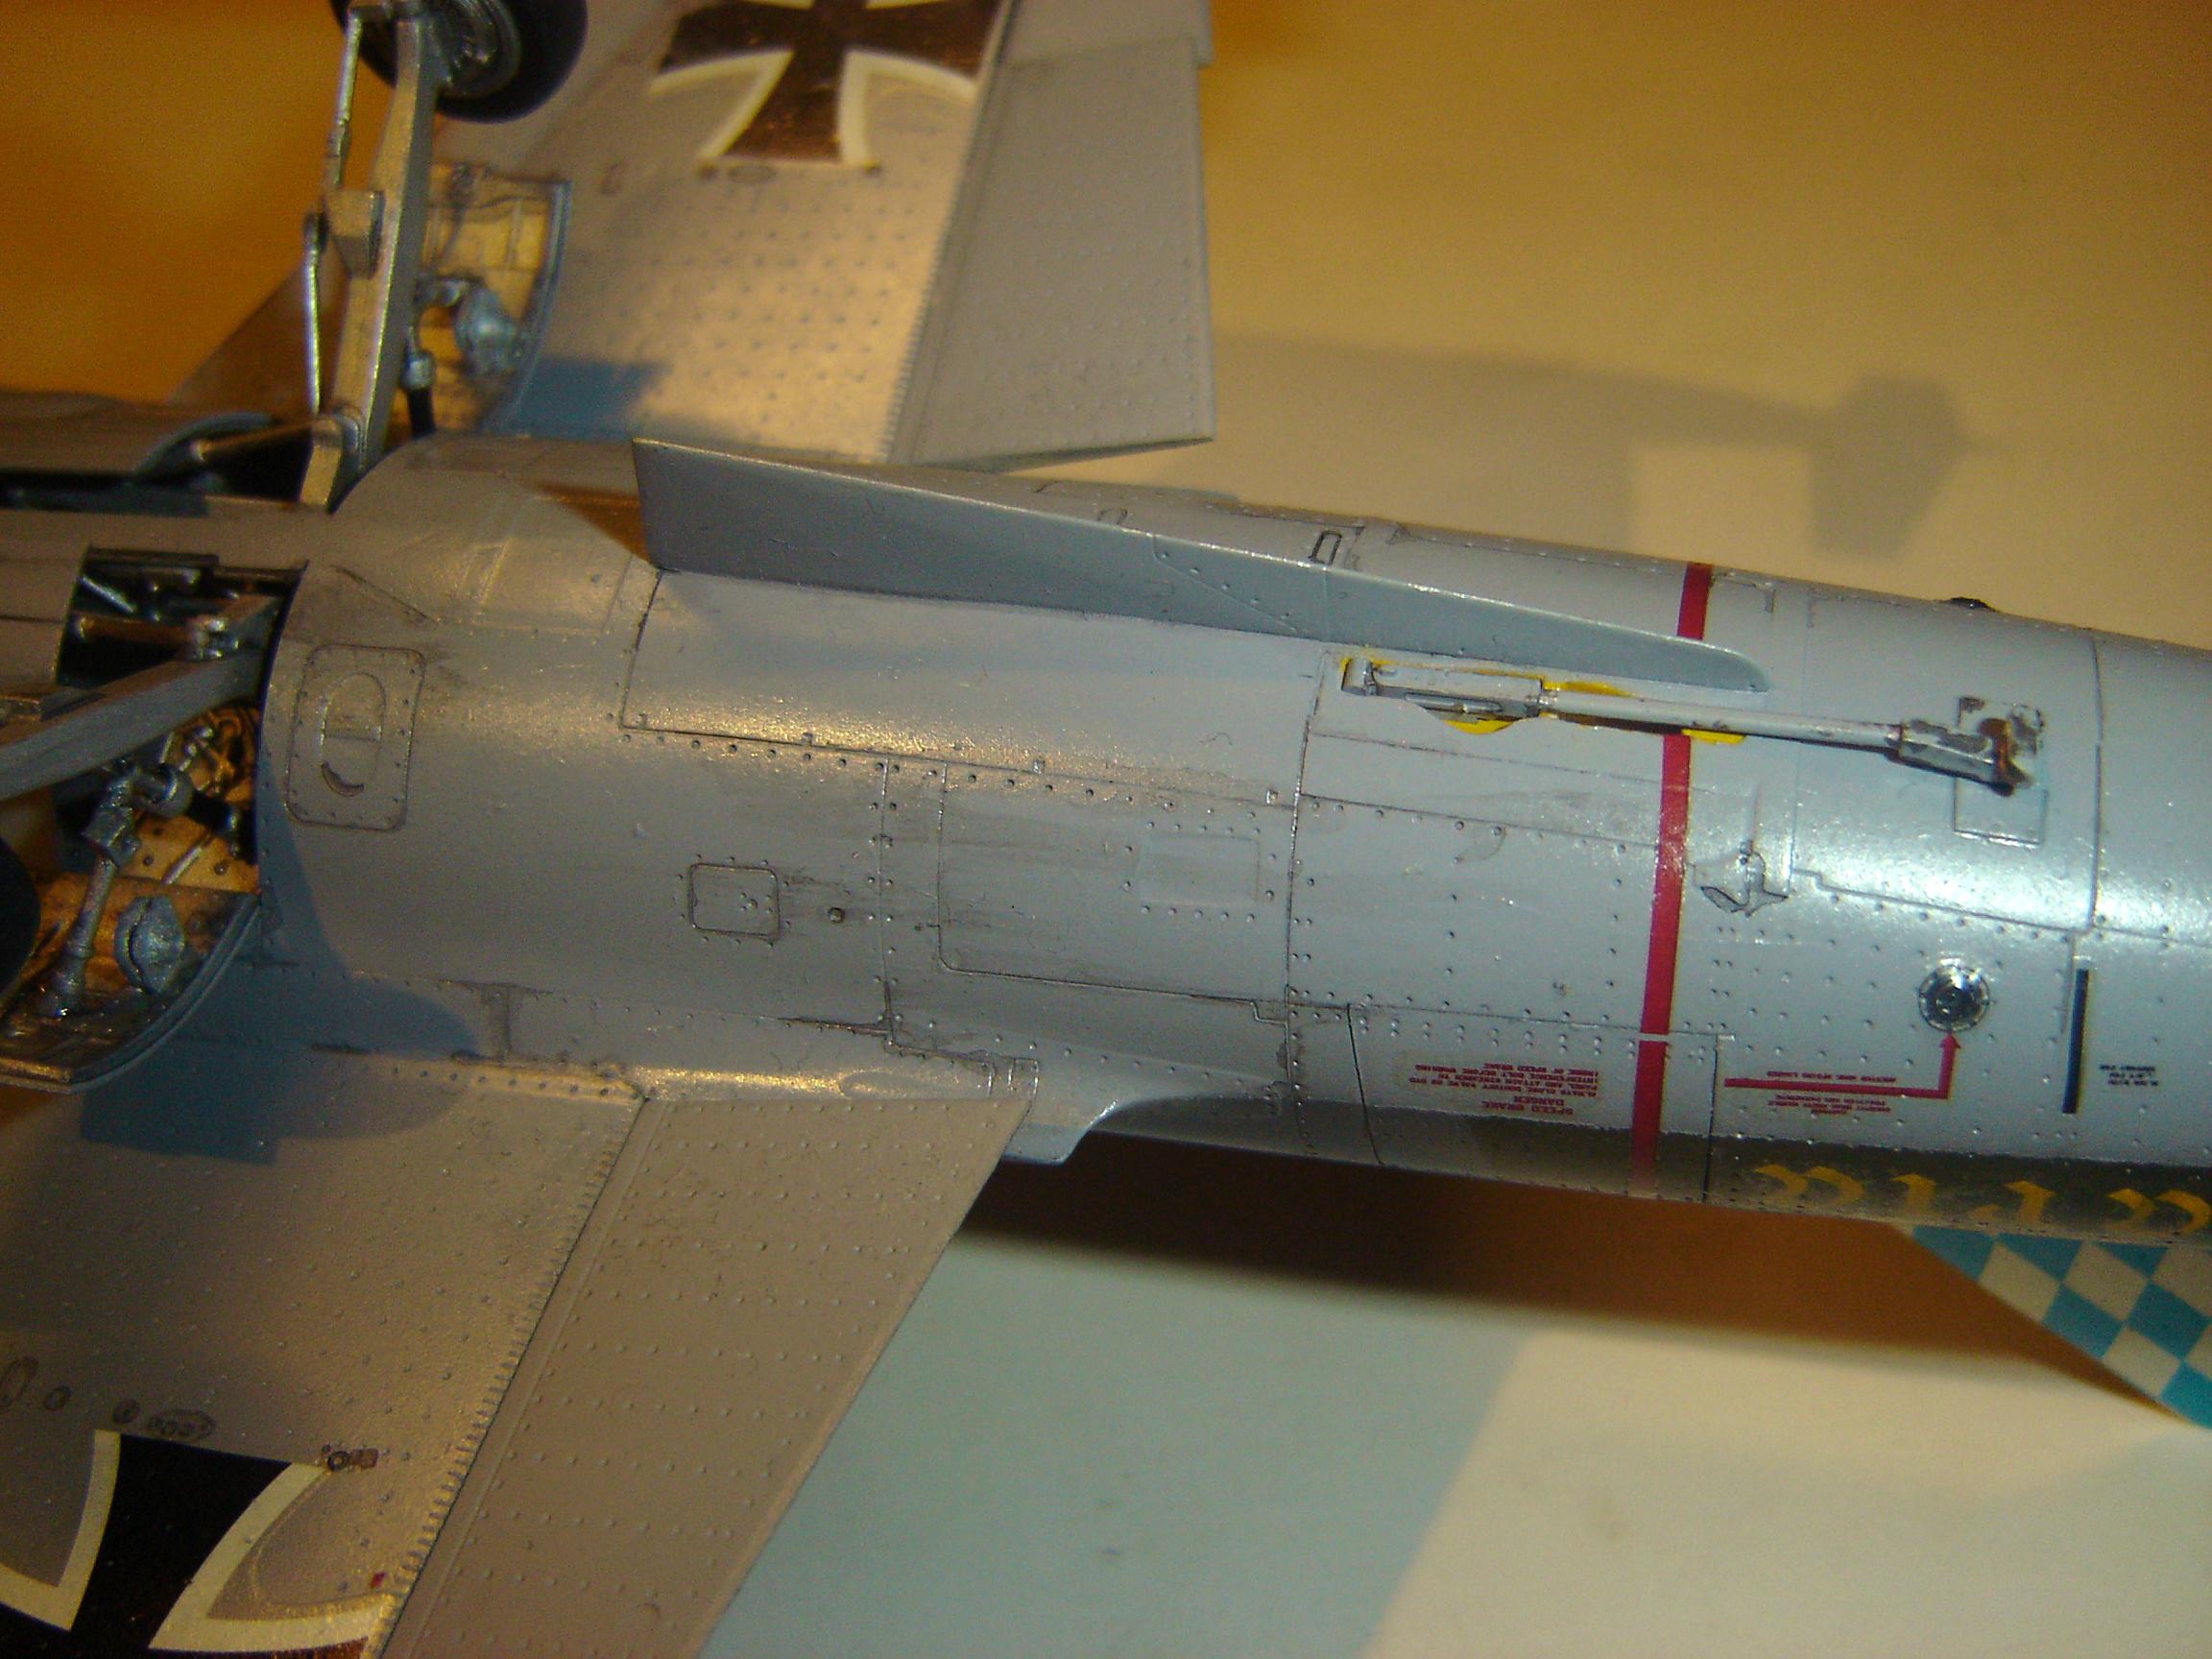 "Lockheed F-104G Starfighter 20+62, JG.32 ""Bavaria"", Luftwaffe, July 1983. Hasegawa kit in 1/48th scale."